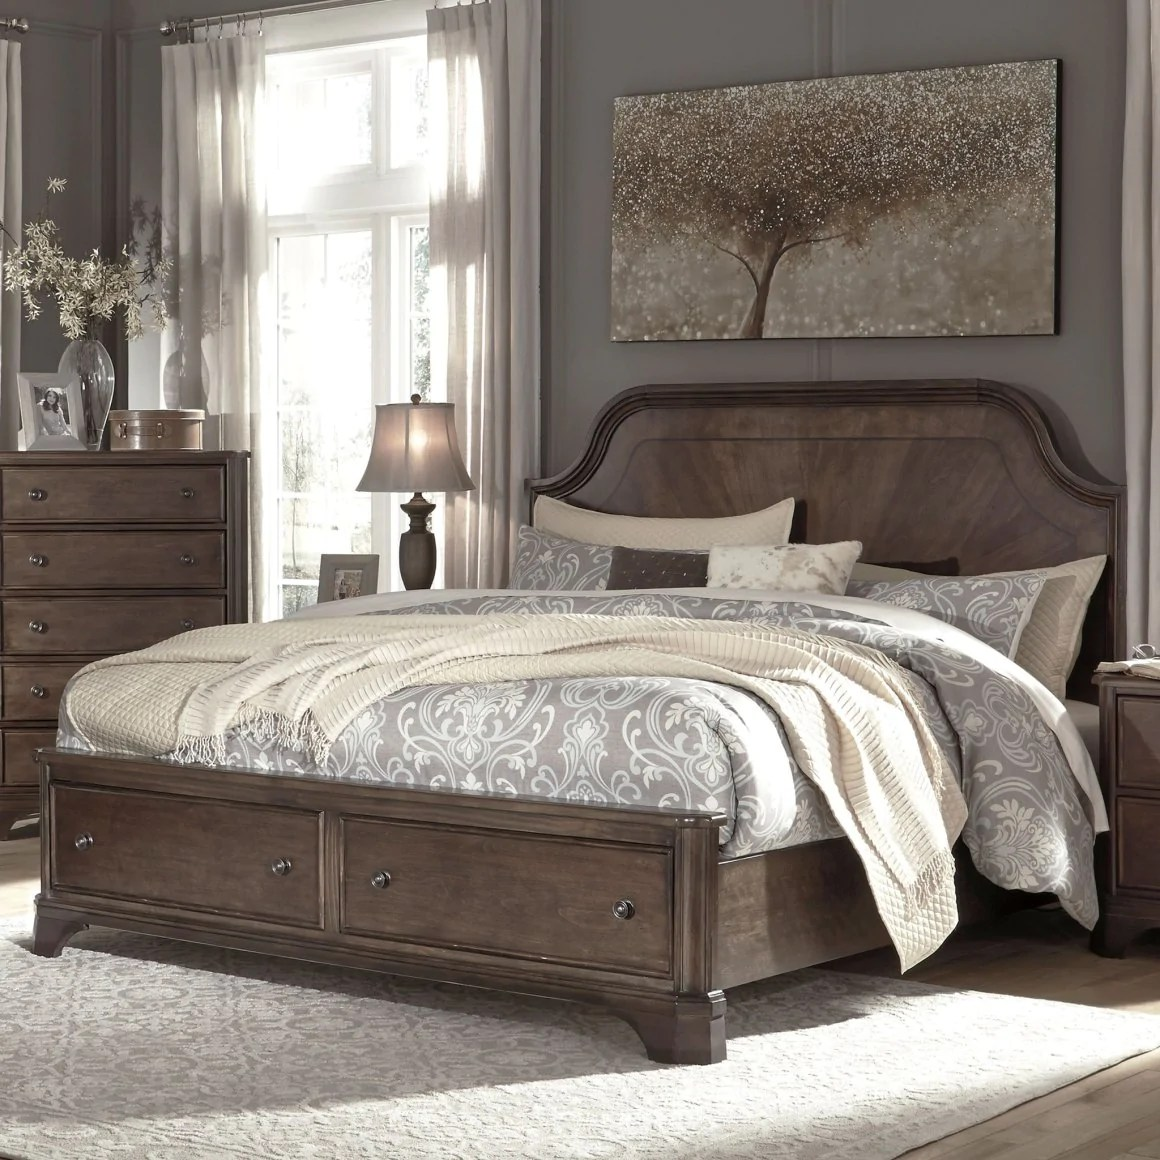 amenajare dormitor clasic